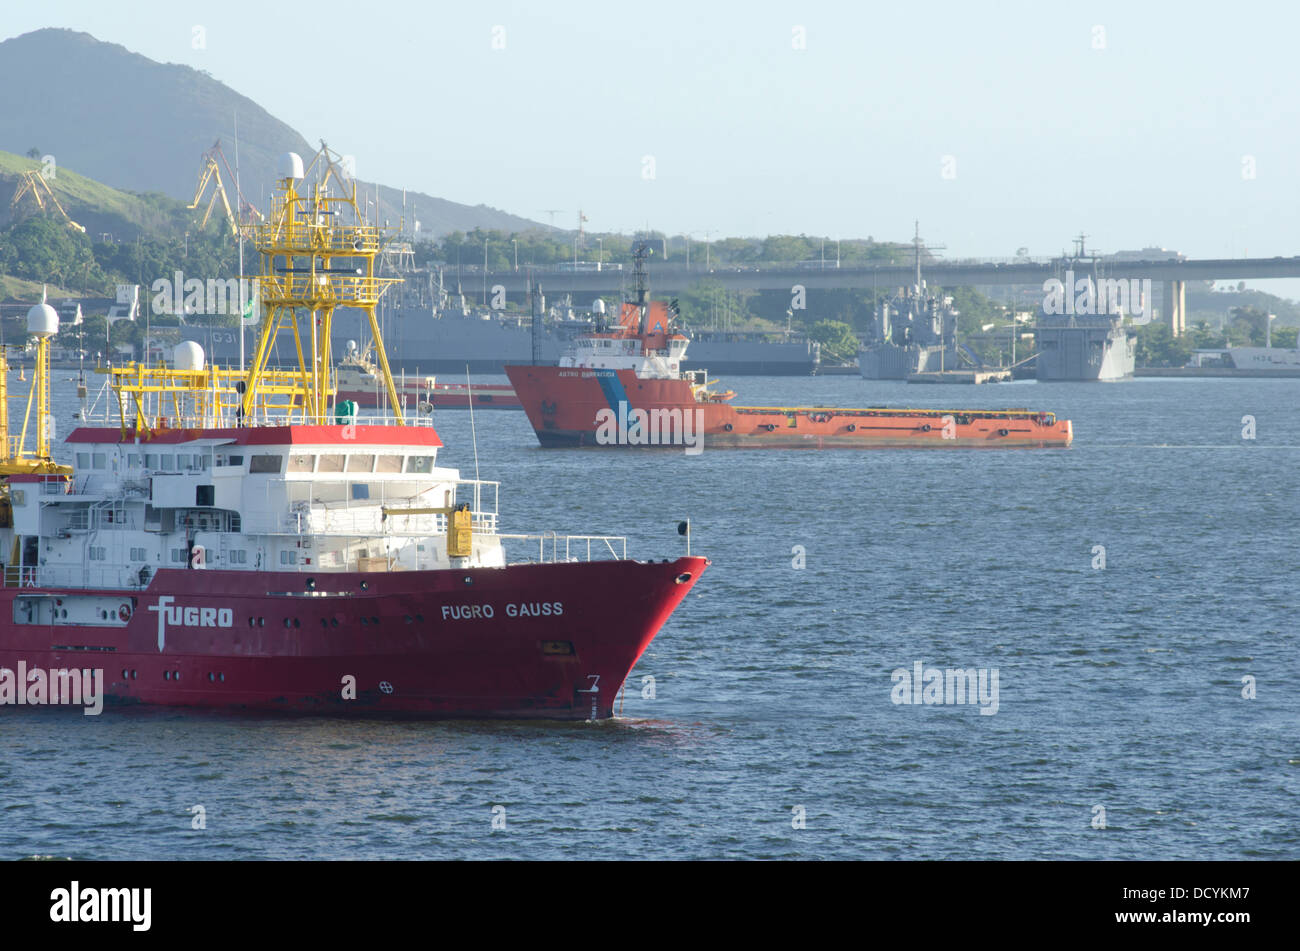 Fugro Gauss survey vessel, anchored at guanabara bay, rio de janeiro, brazil - Stock Image